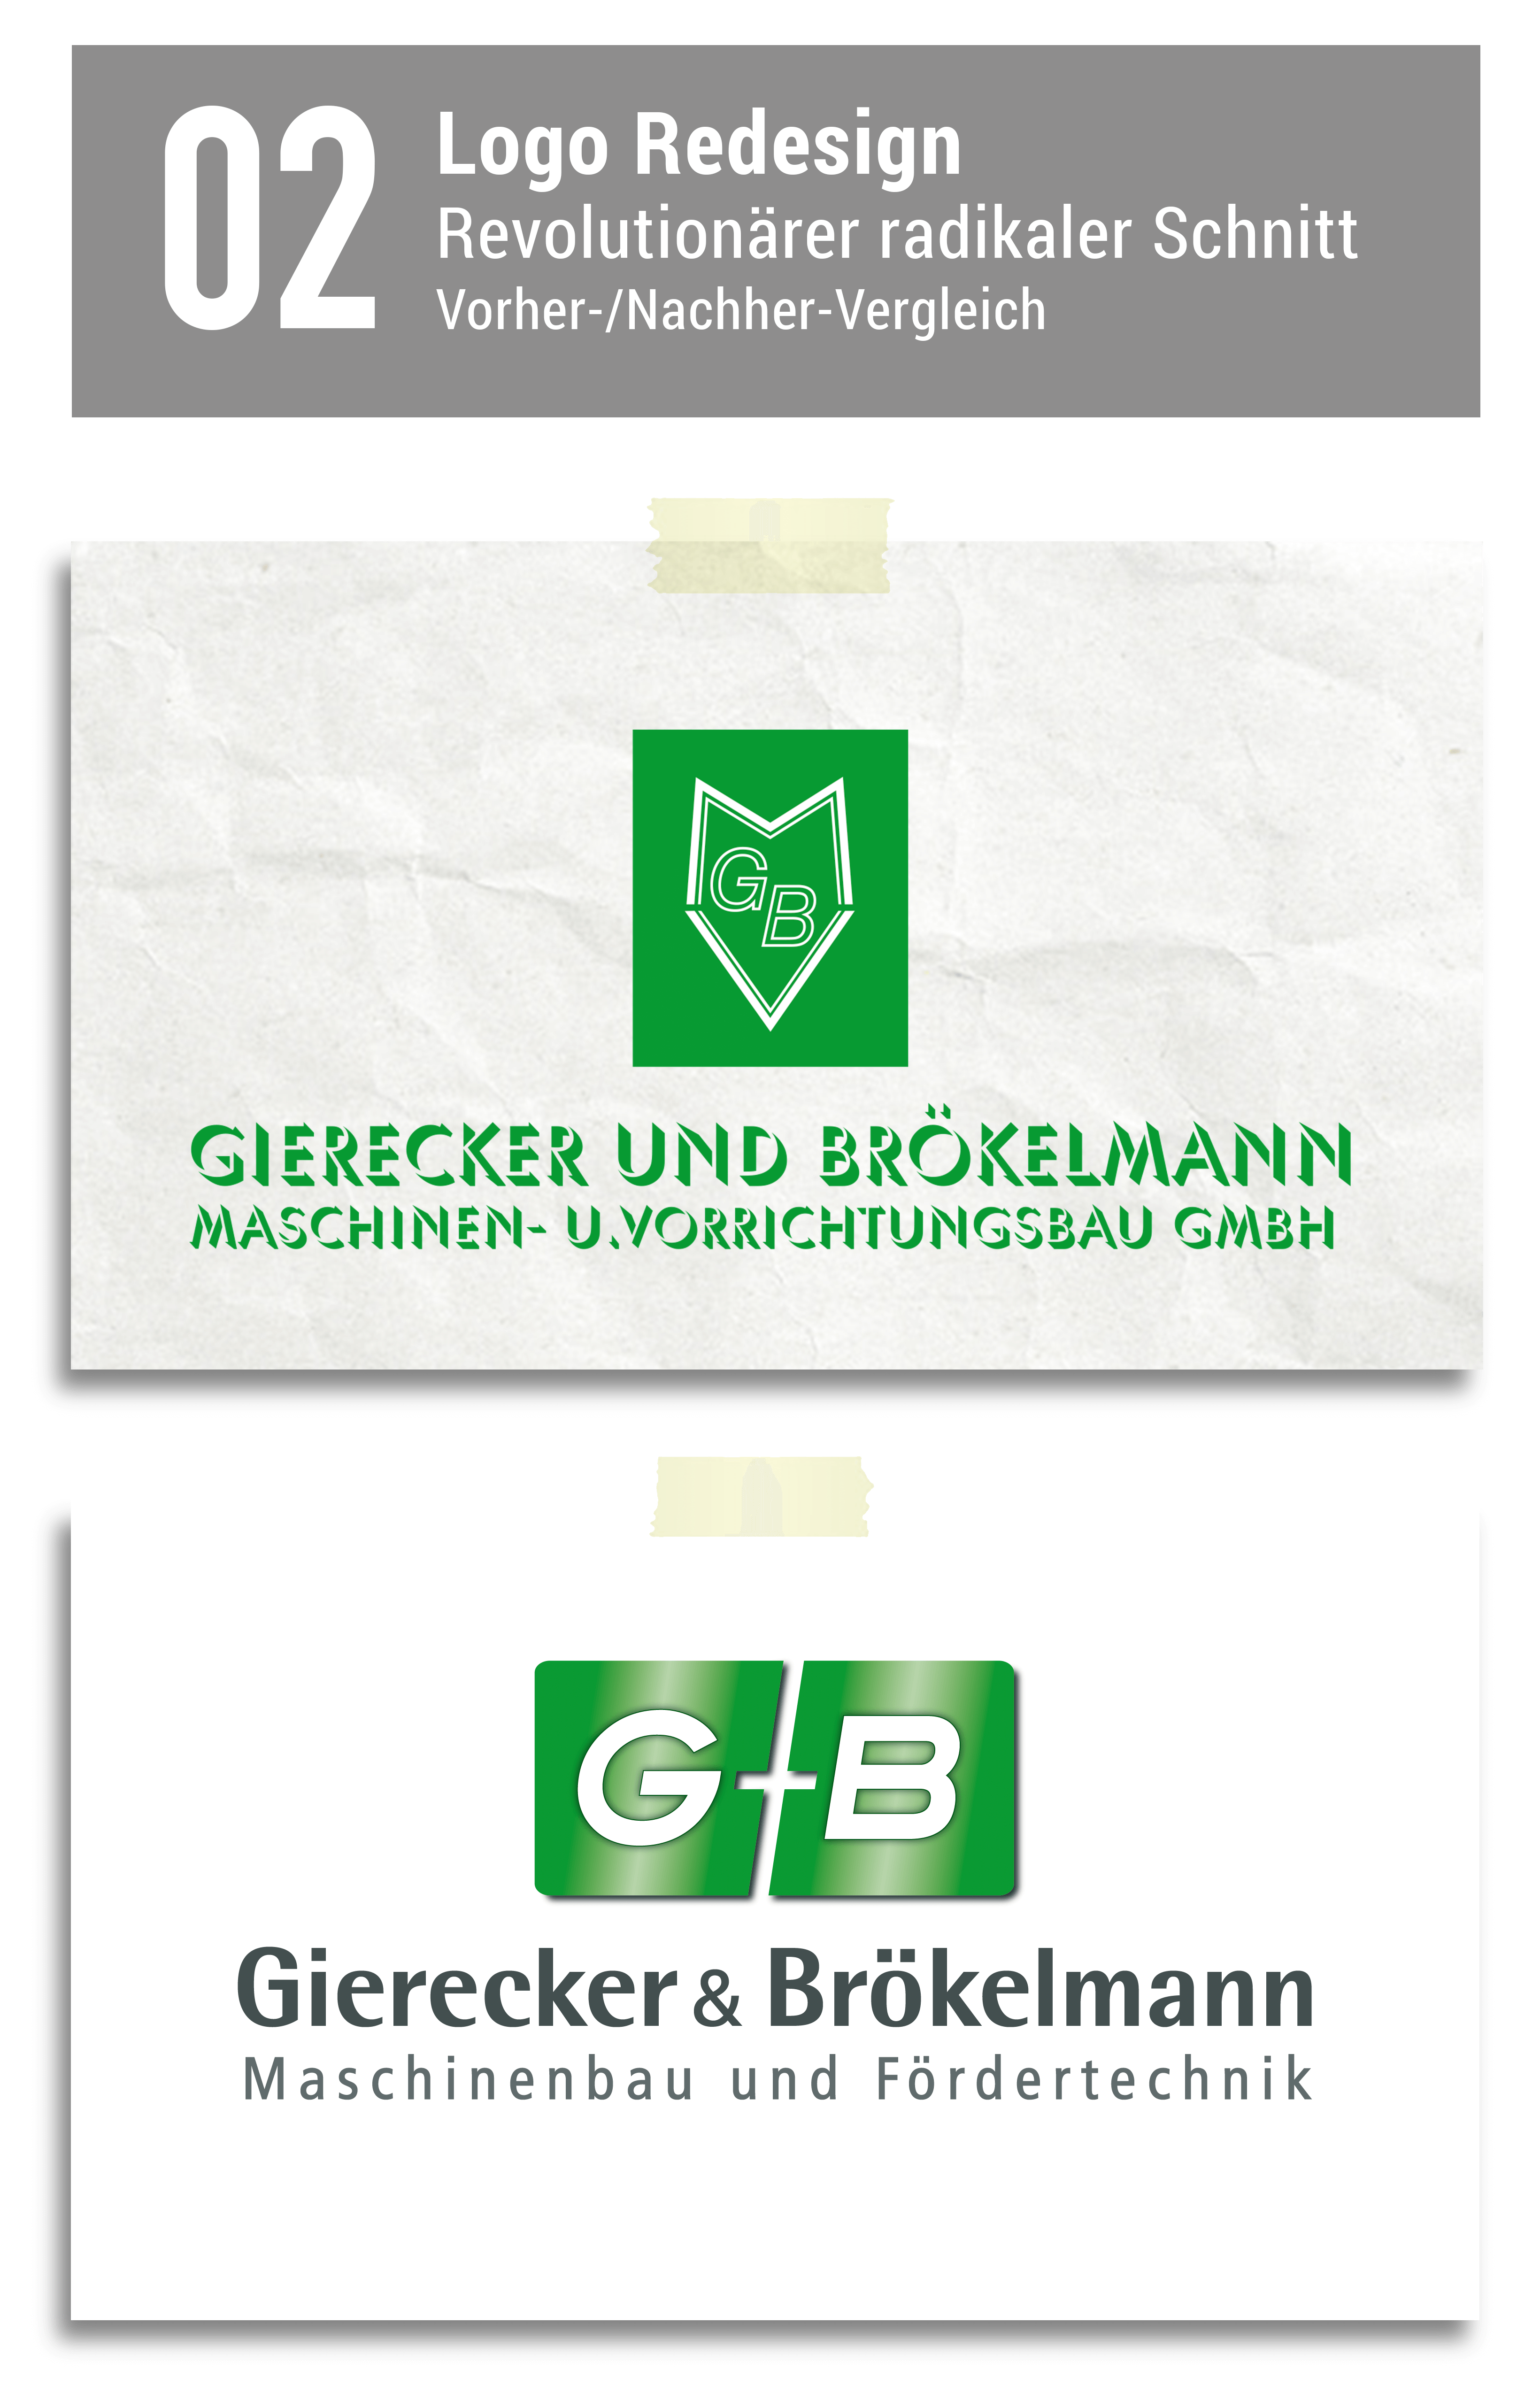 Redesign_G+B_RZ